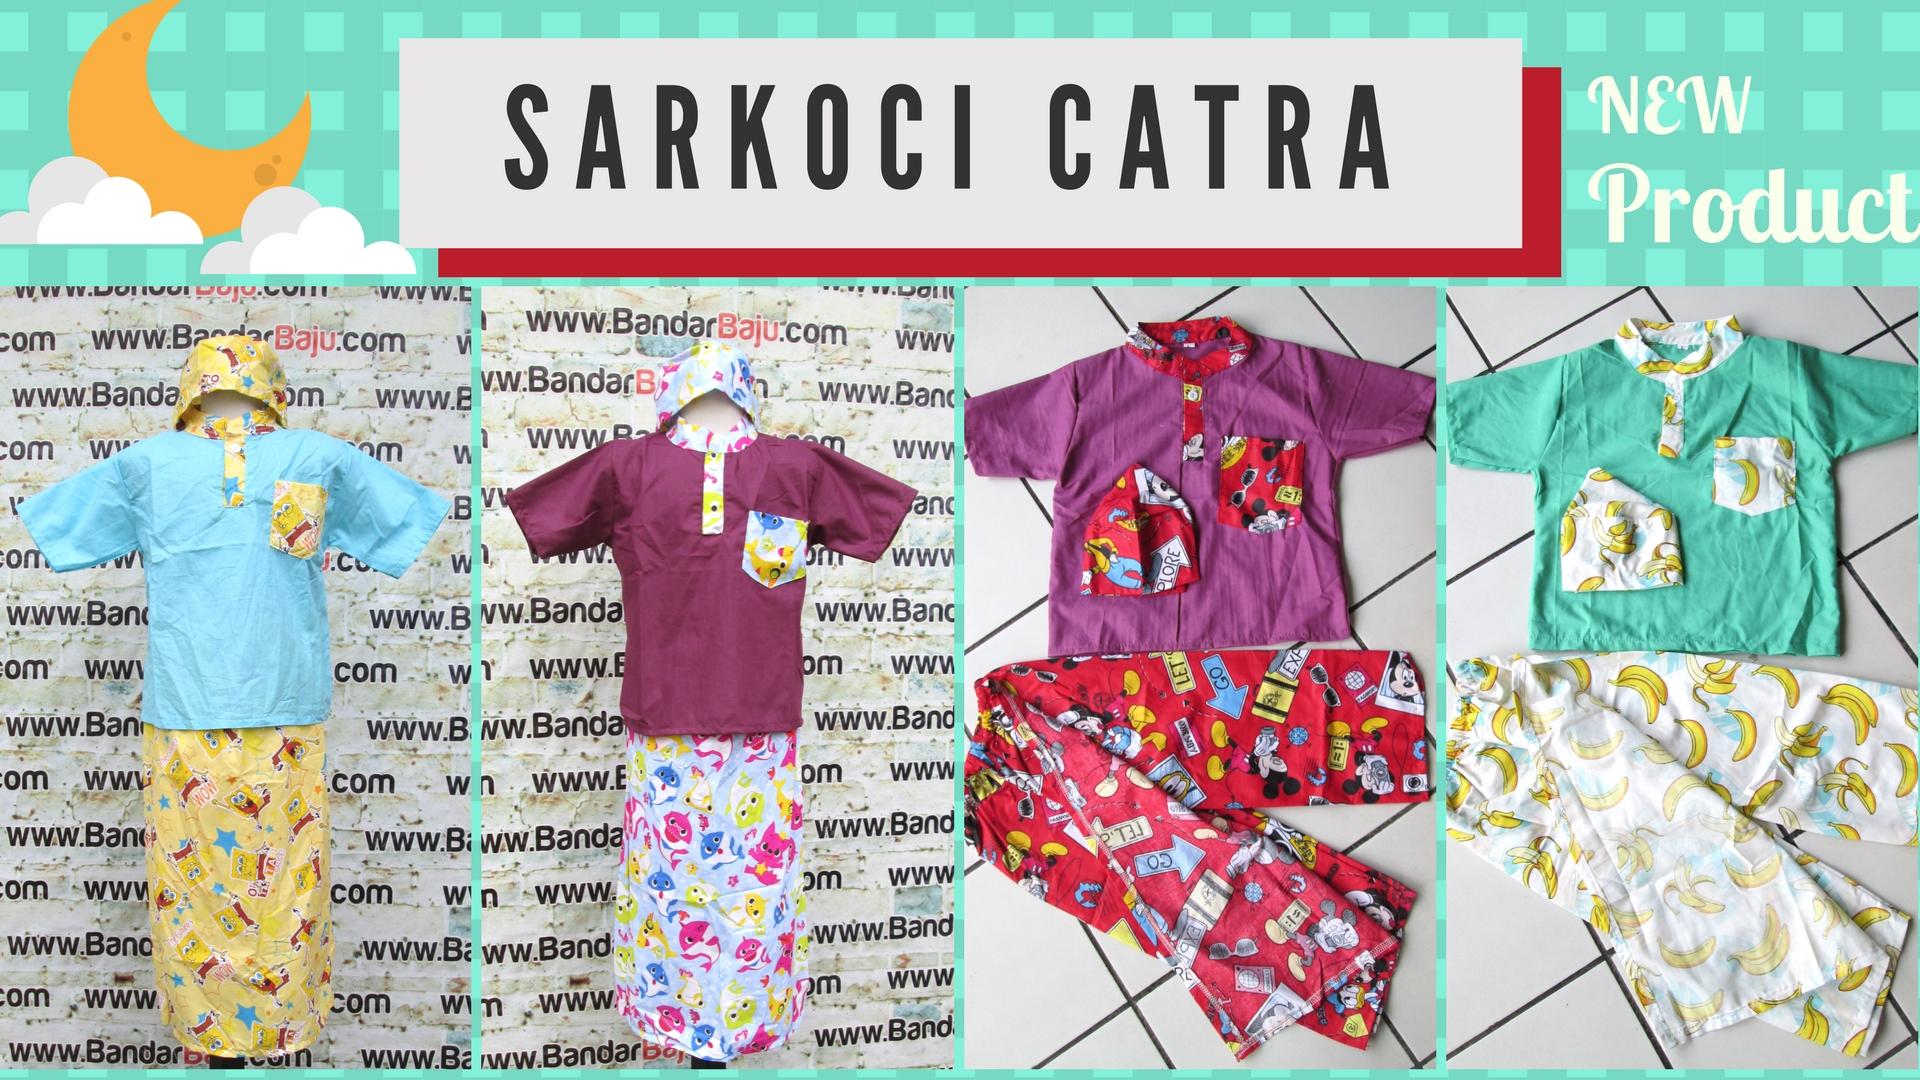 GROSIR PAKAIAN MURAH ONLINE DI BANDUNG Produsen Koko Sarkoci Catra Anak Murah Bandung 35Ribu